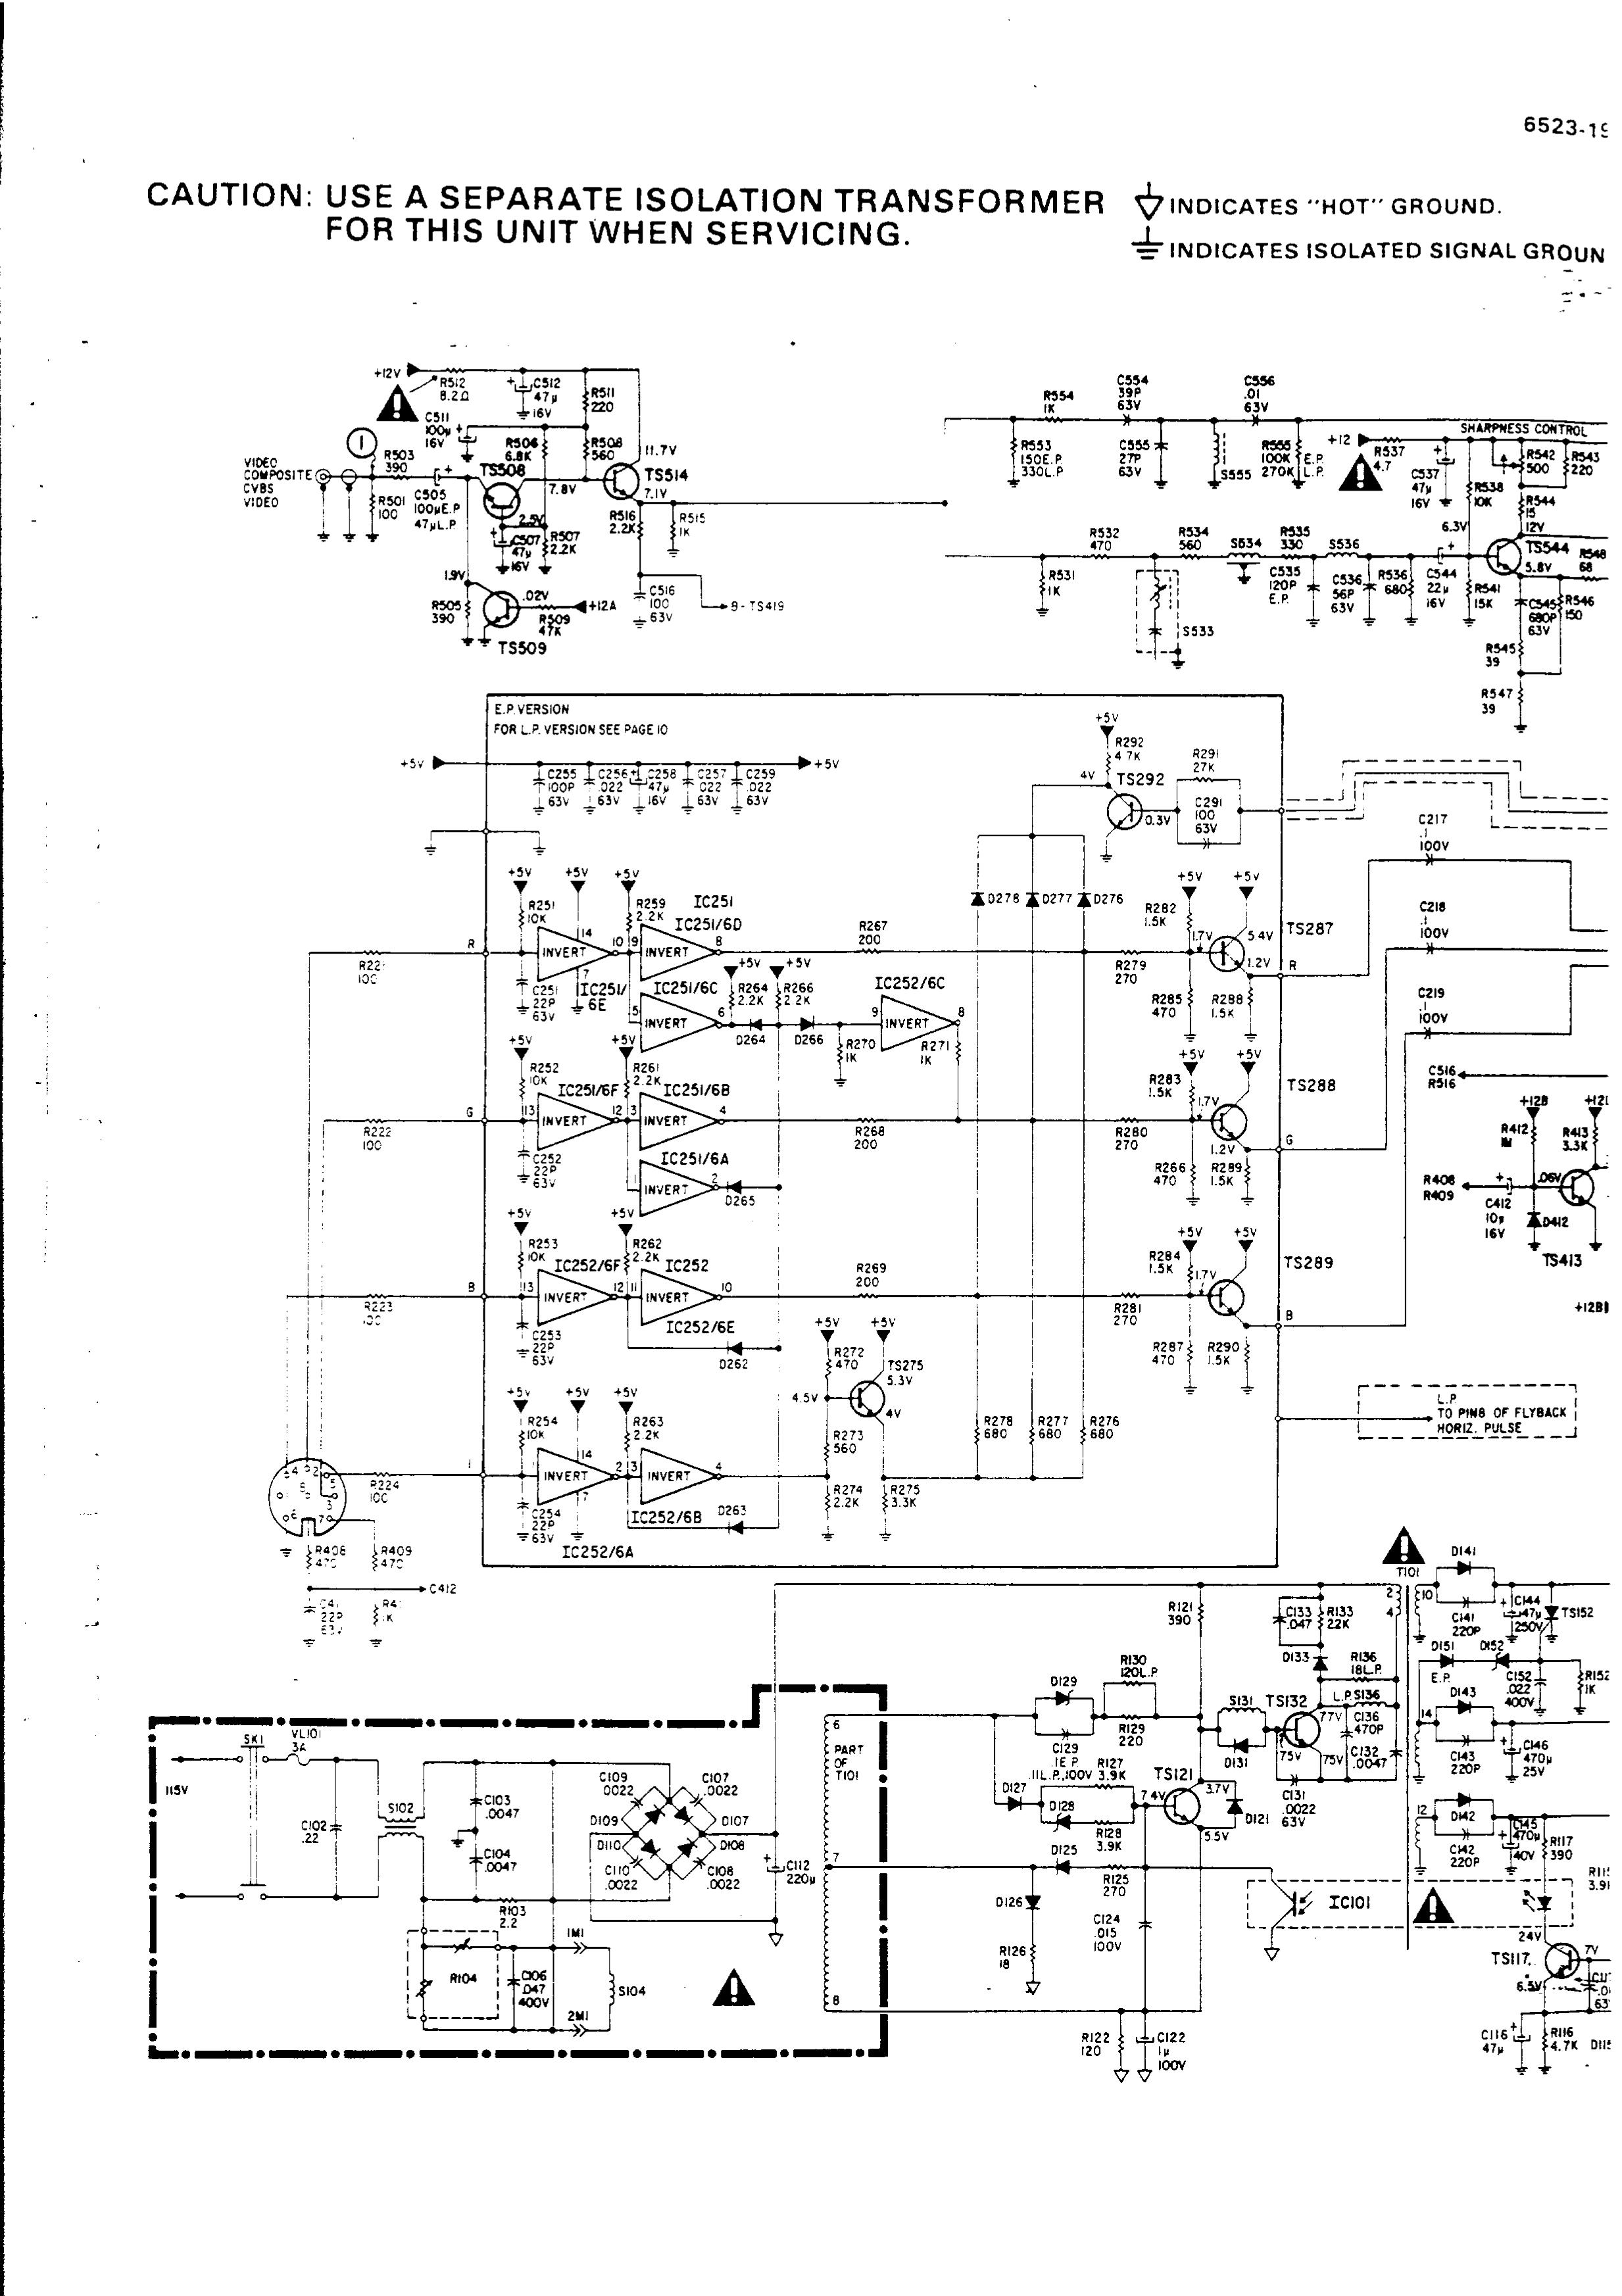 schematic-1.png